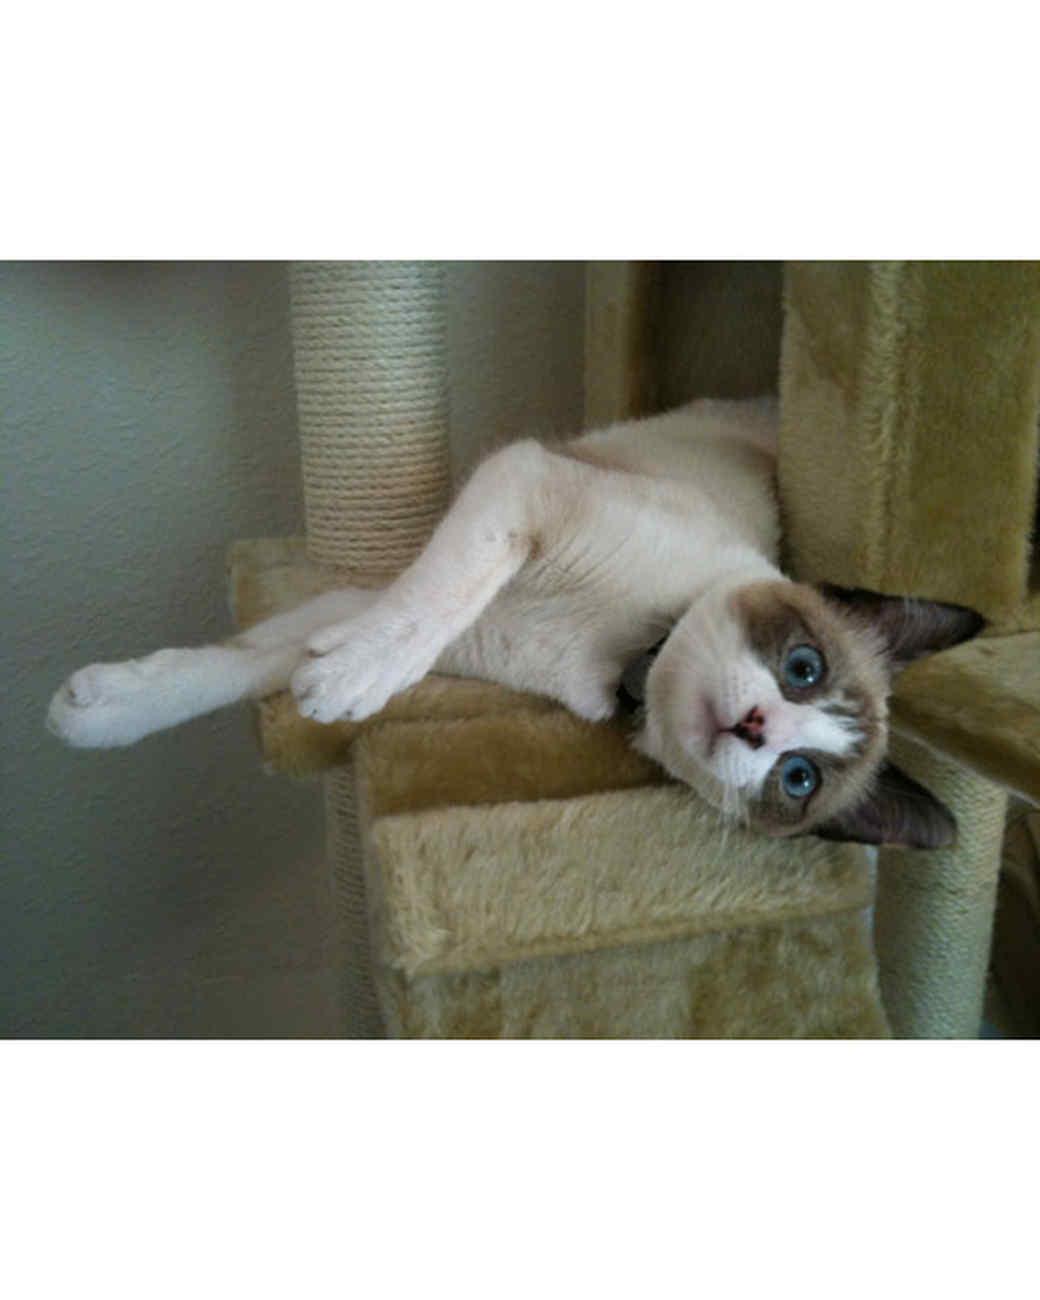 pets_adoption_6899176_18679357.jpg